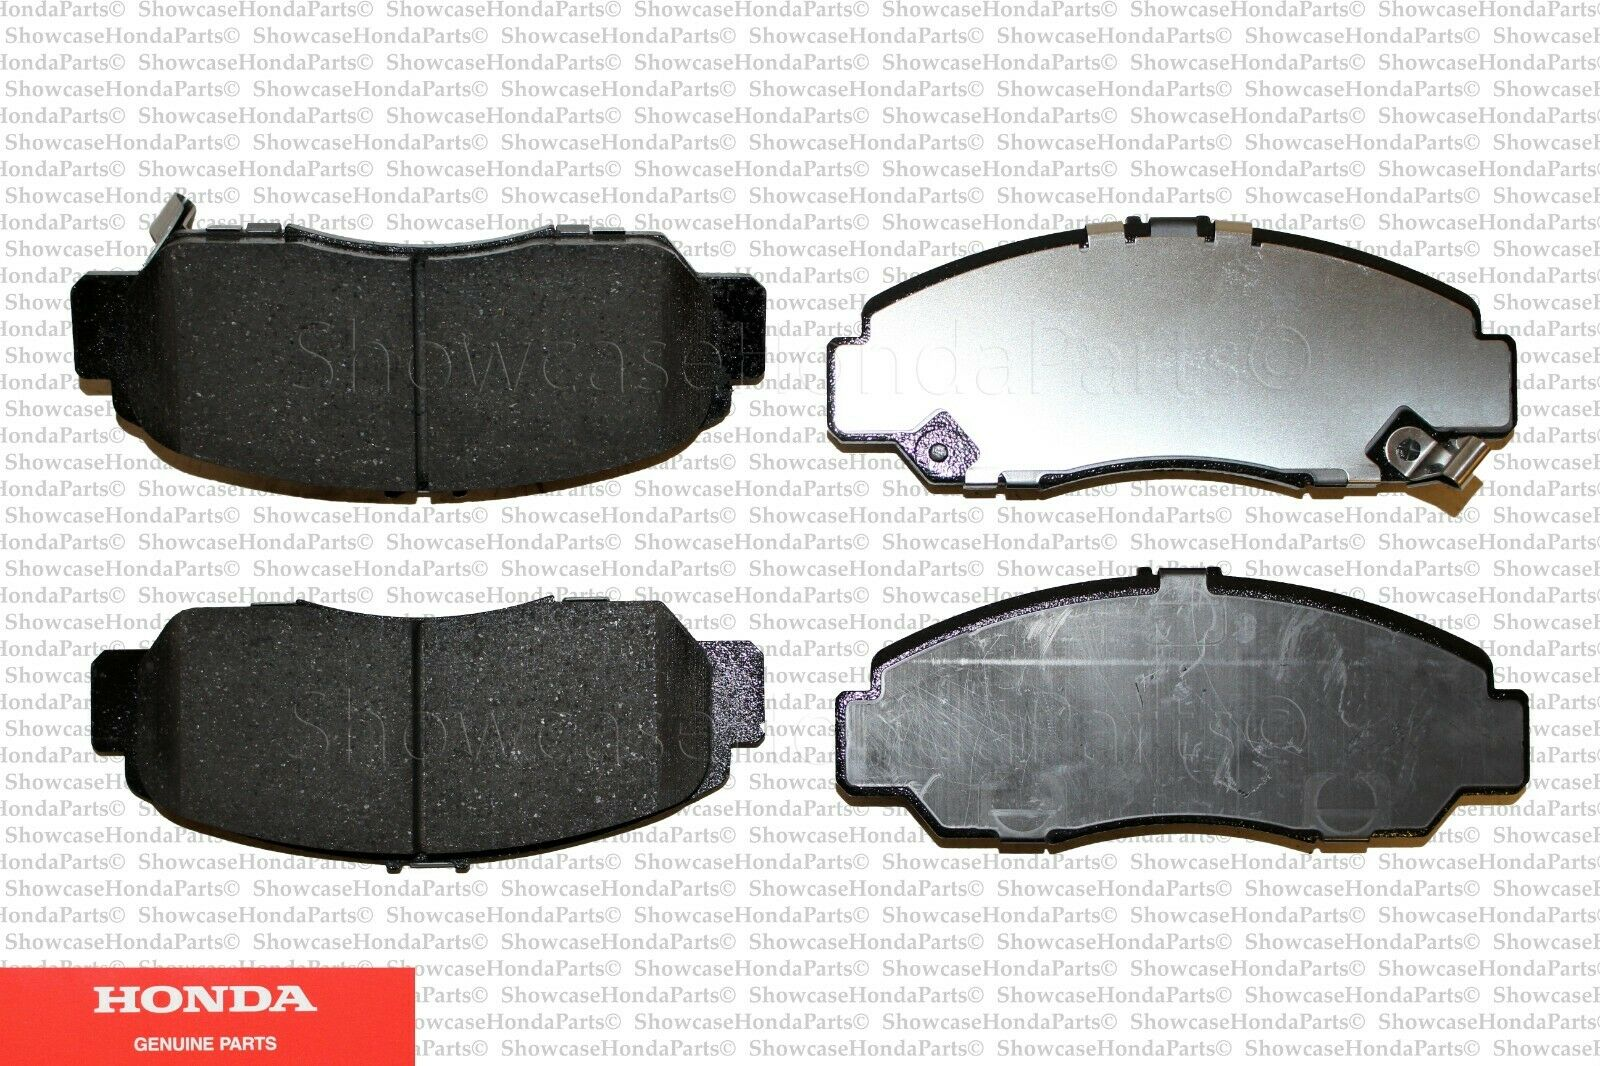 2016-2020 Civic Grease,Shims,Pads Genuine Honda OEM Front Brake Pad Kit Fits